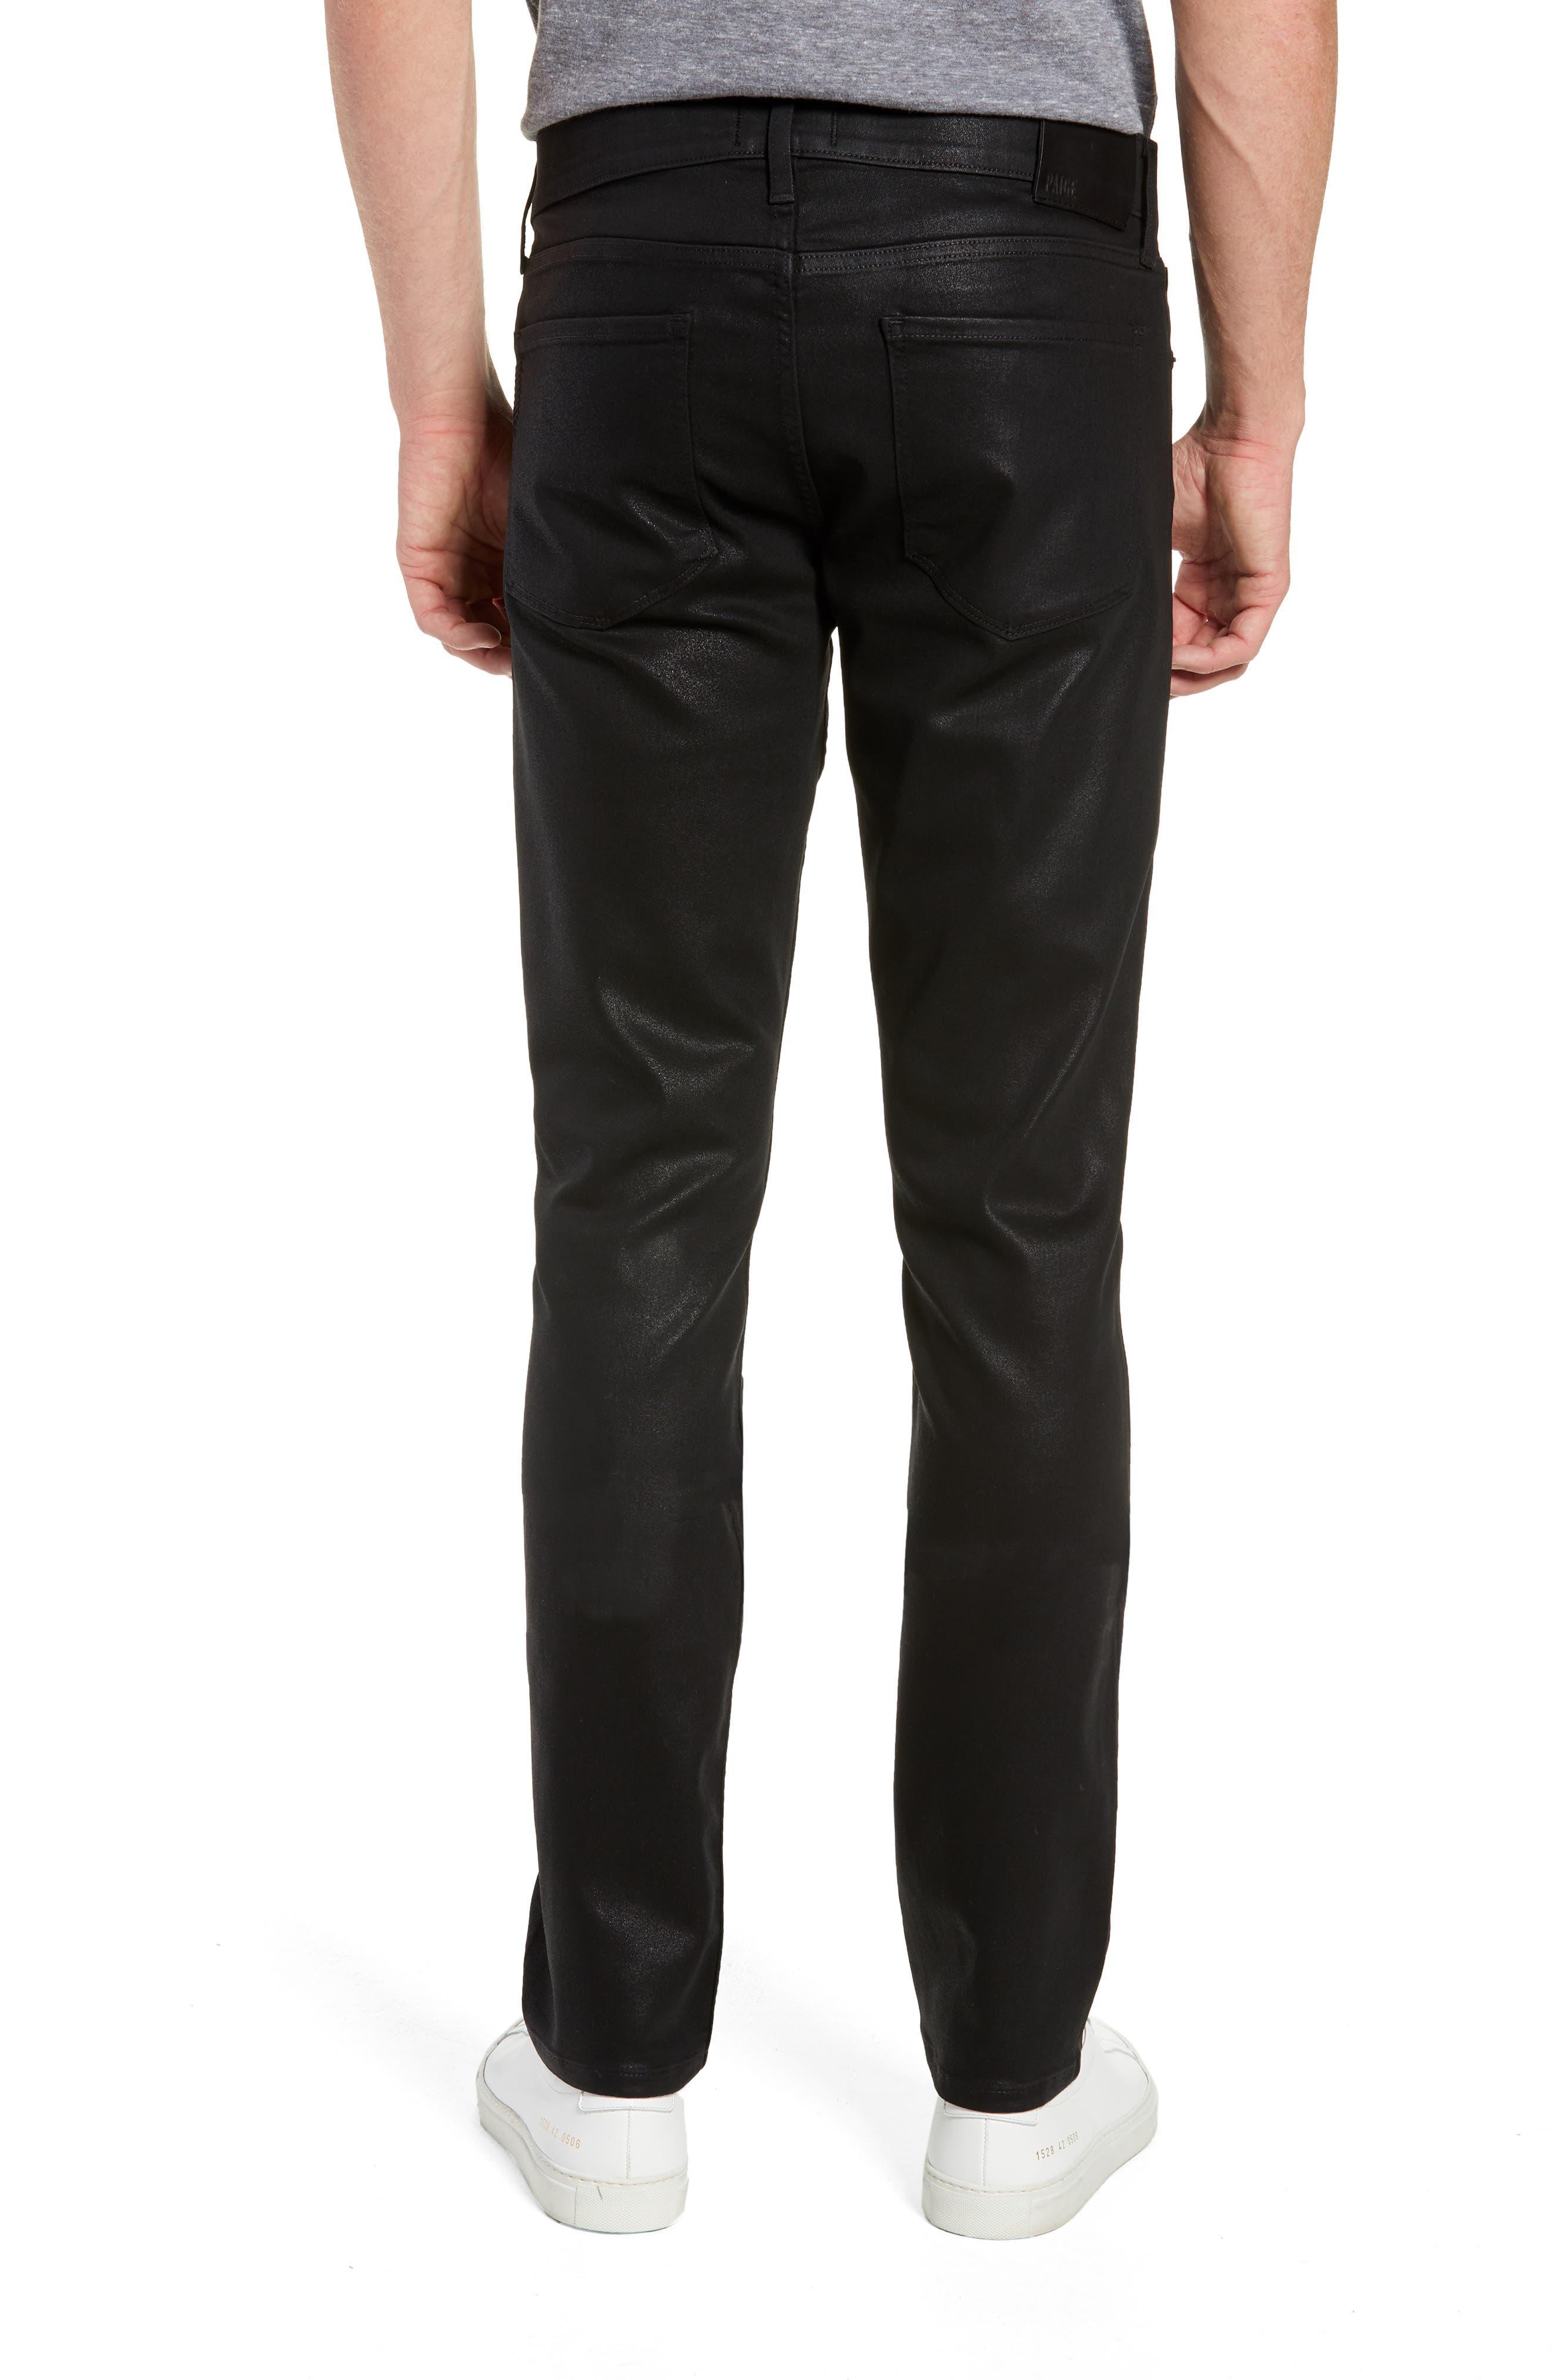 Transcend - Lennox Slim Fit Jeans,                             Alternate thumbnail 2, color,                             WILKS COATED